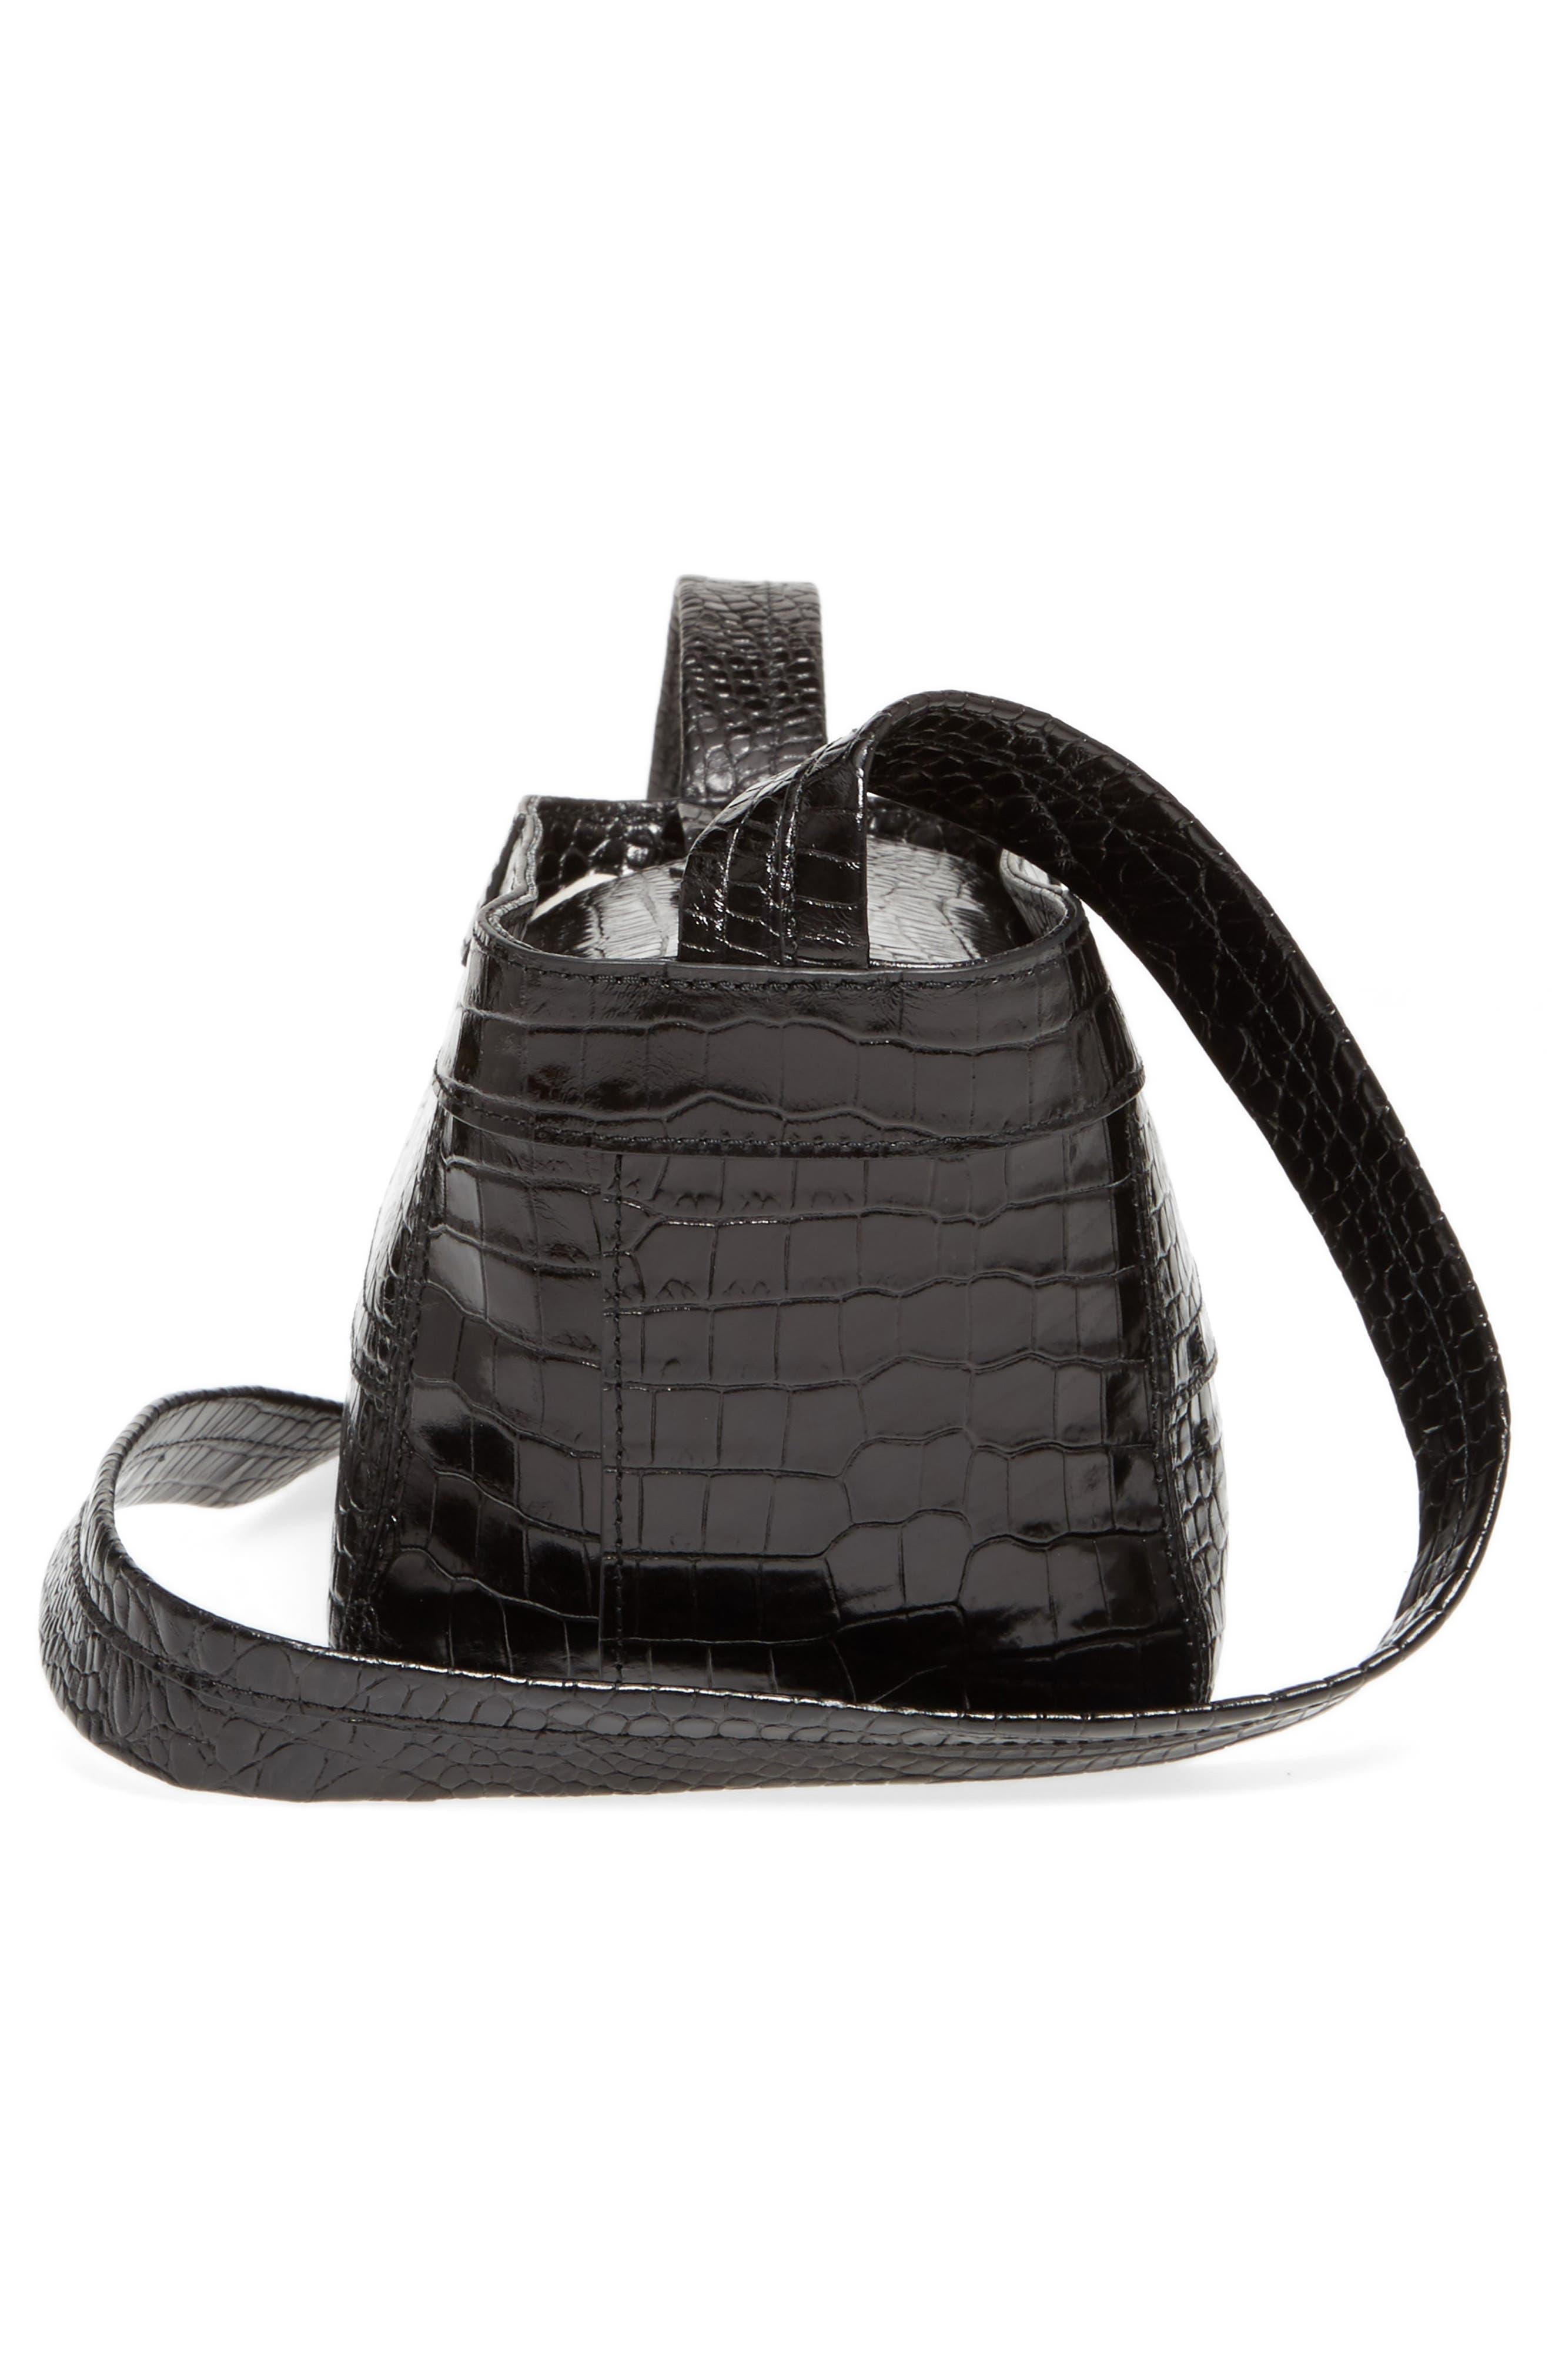 Keely Leather Crossbody Bag,                             Alternate thumbnail 5, color,                             Black